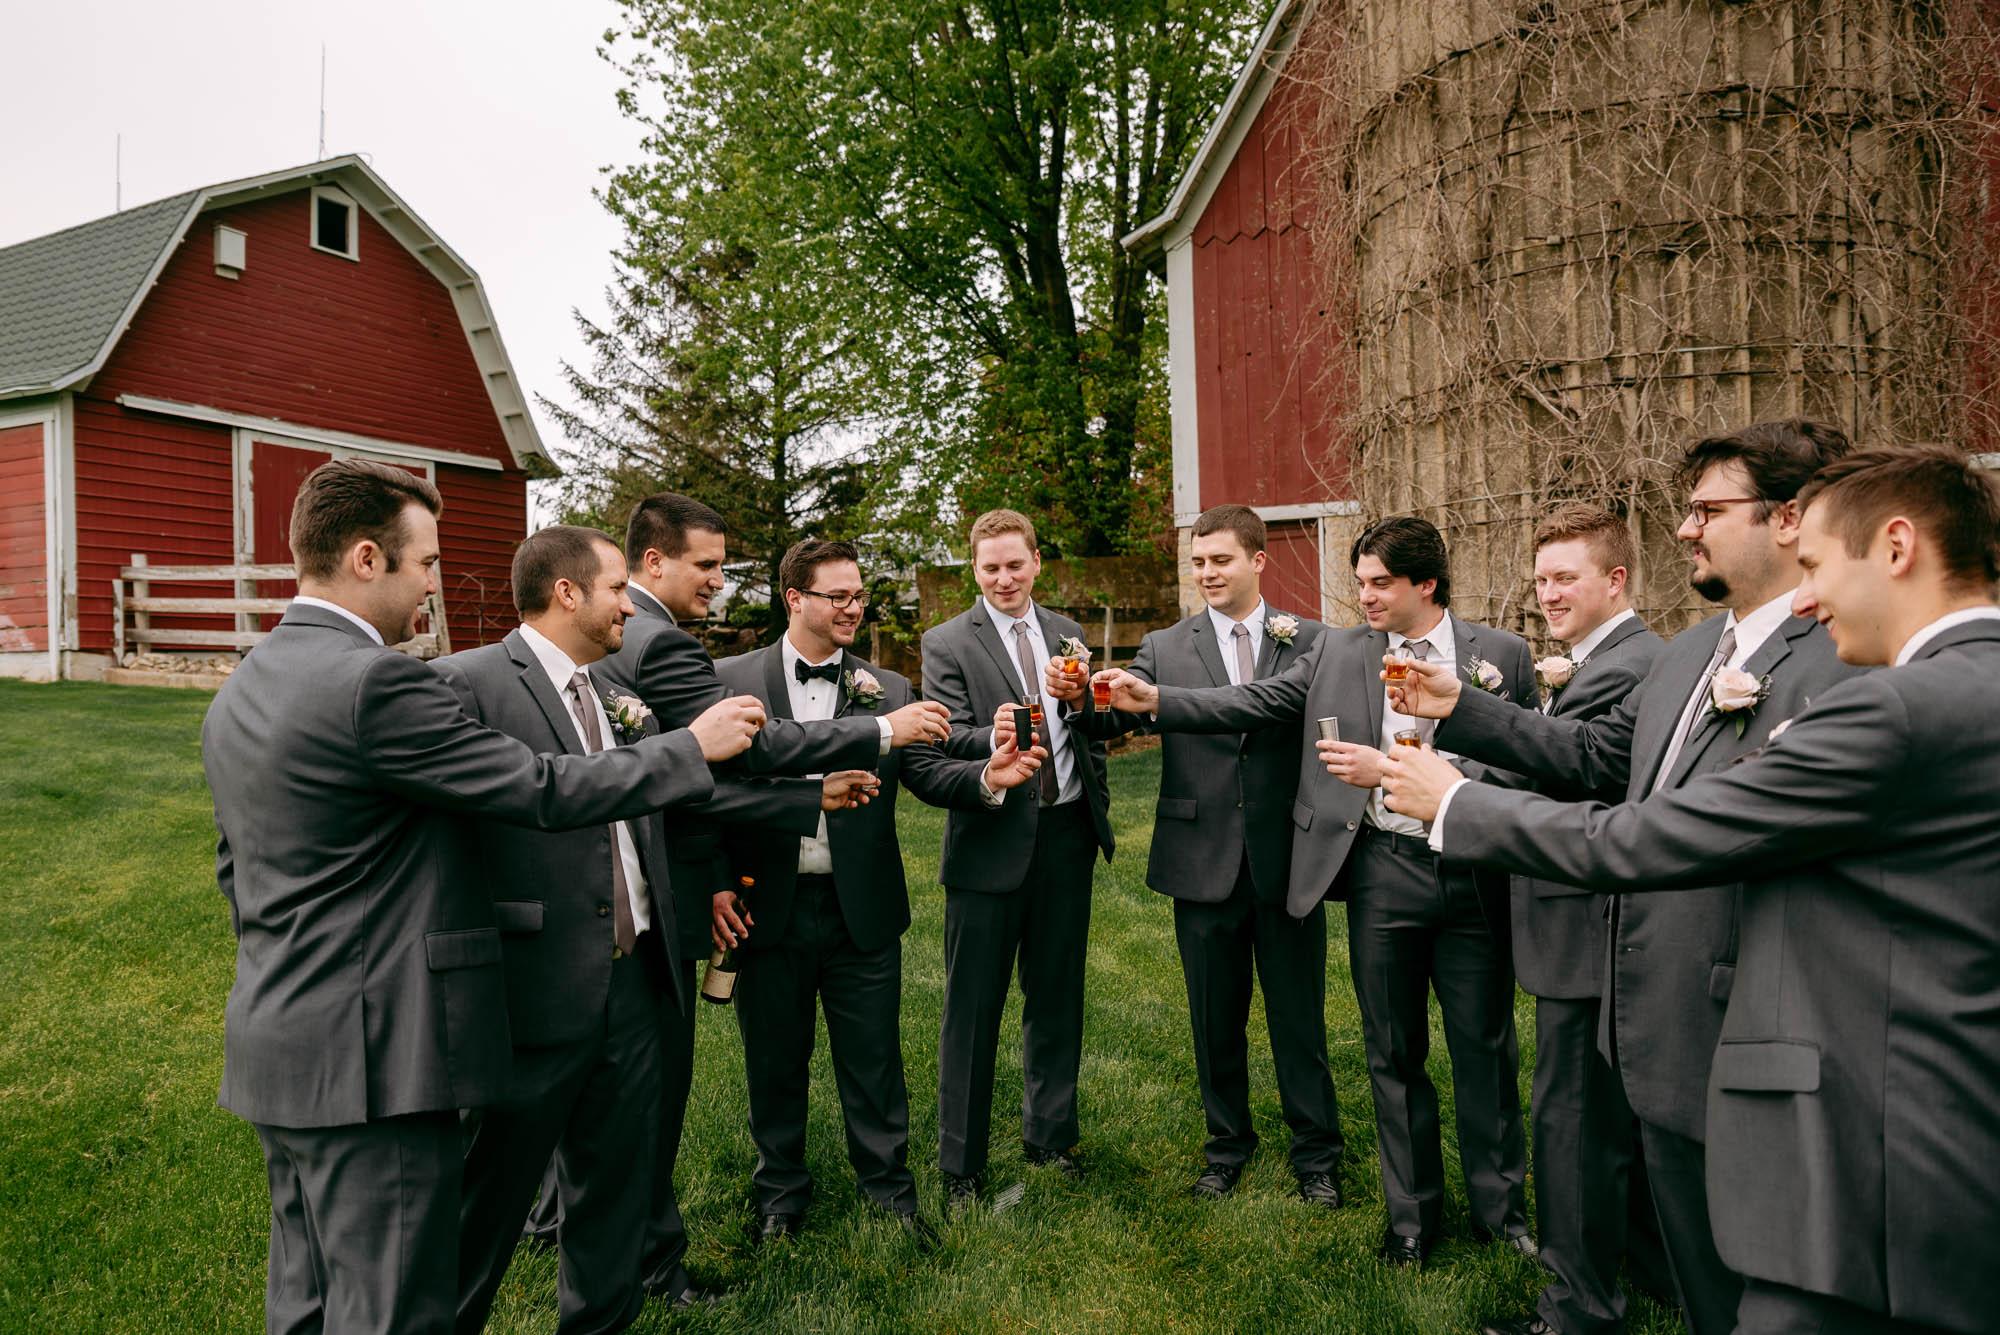 orchard-farms-pavillion-wedding-rockton-IL-wedding-photographers-131.jpg